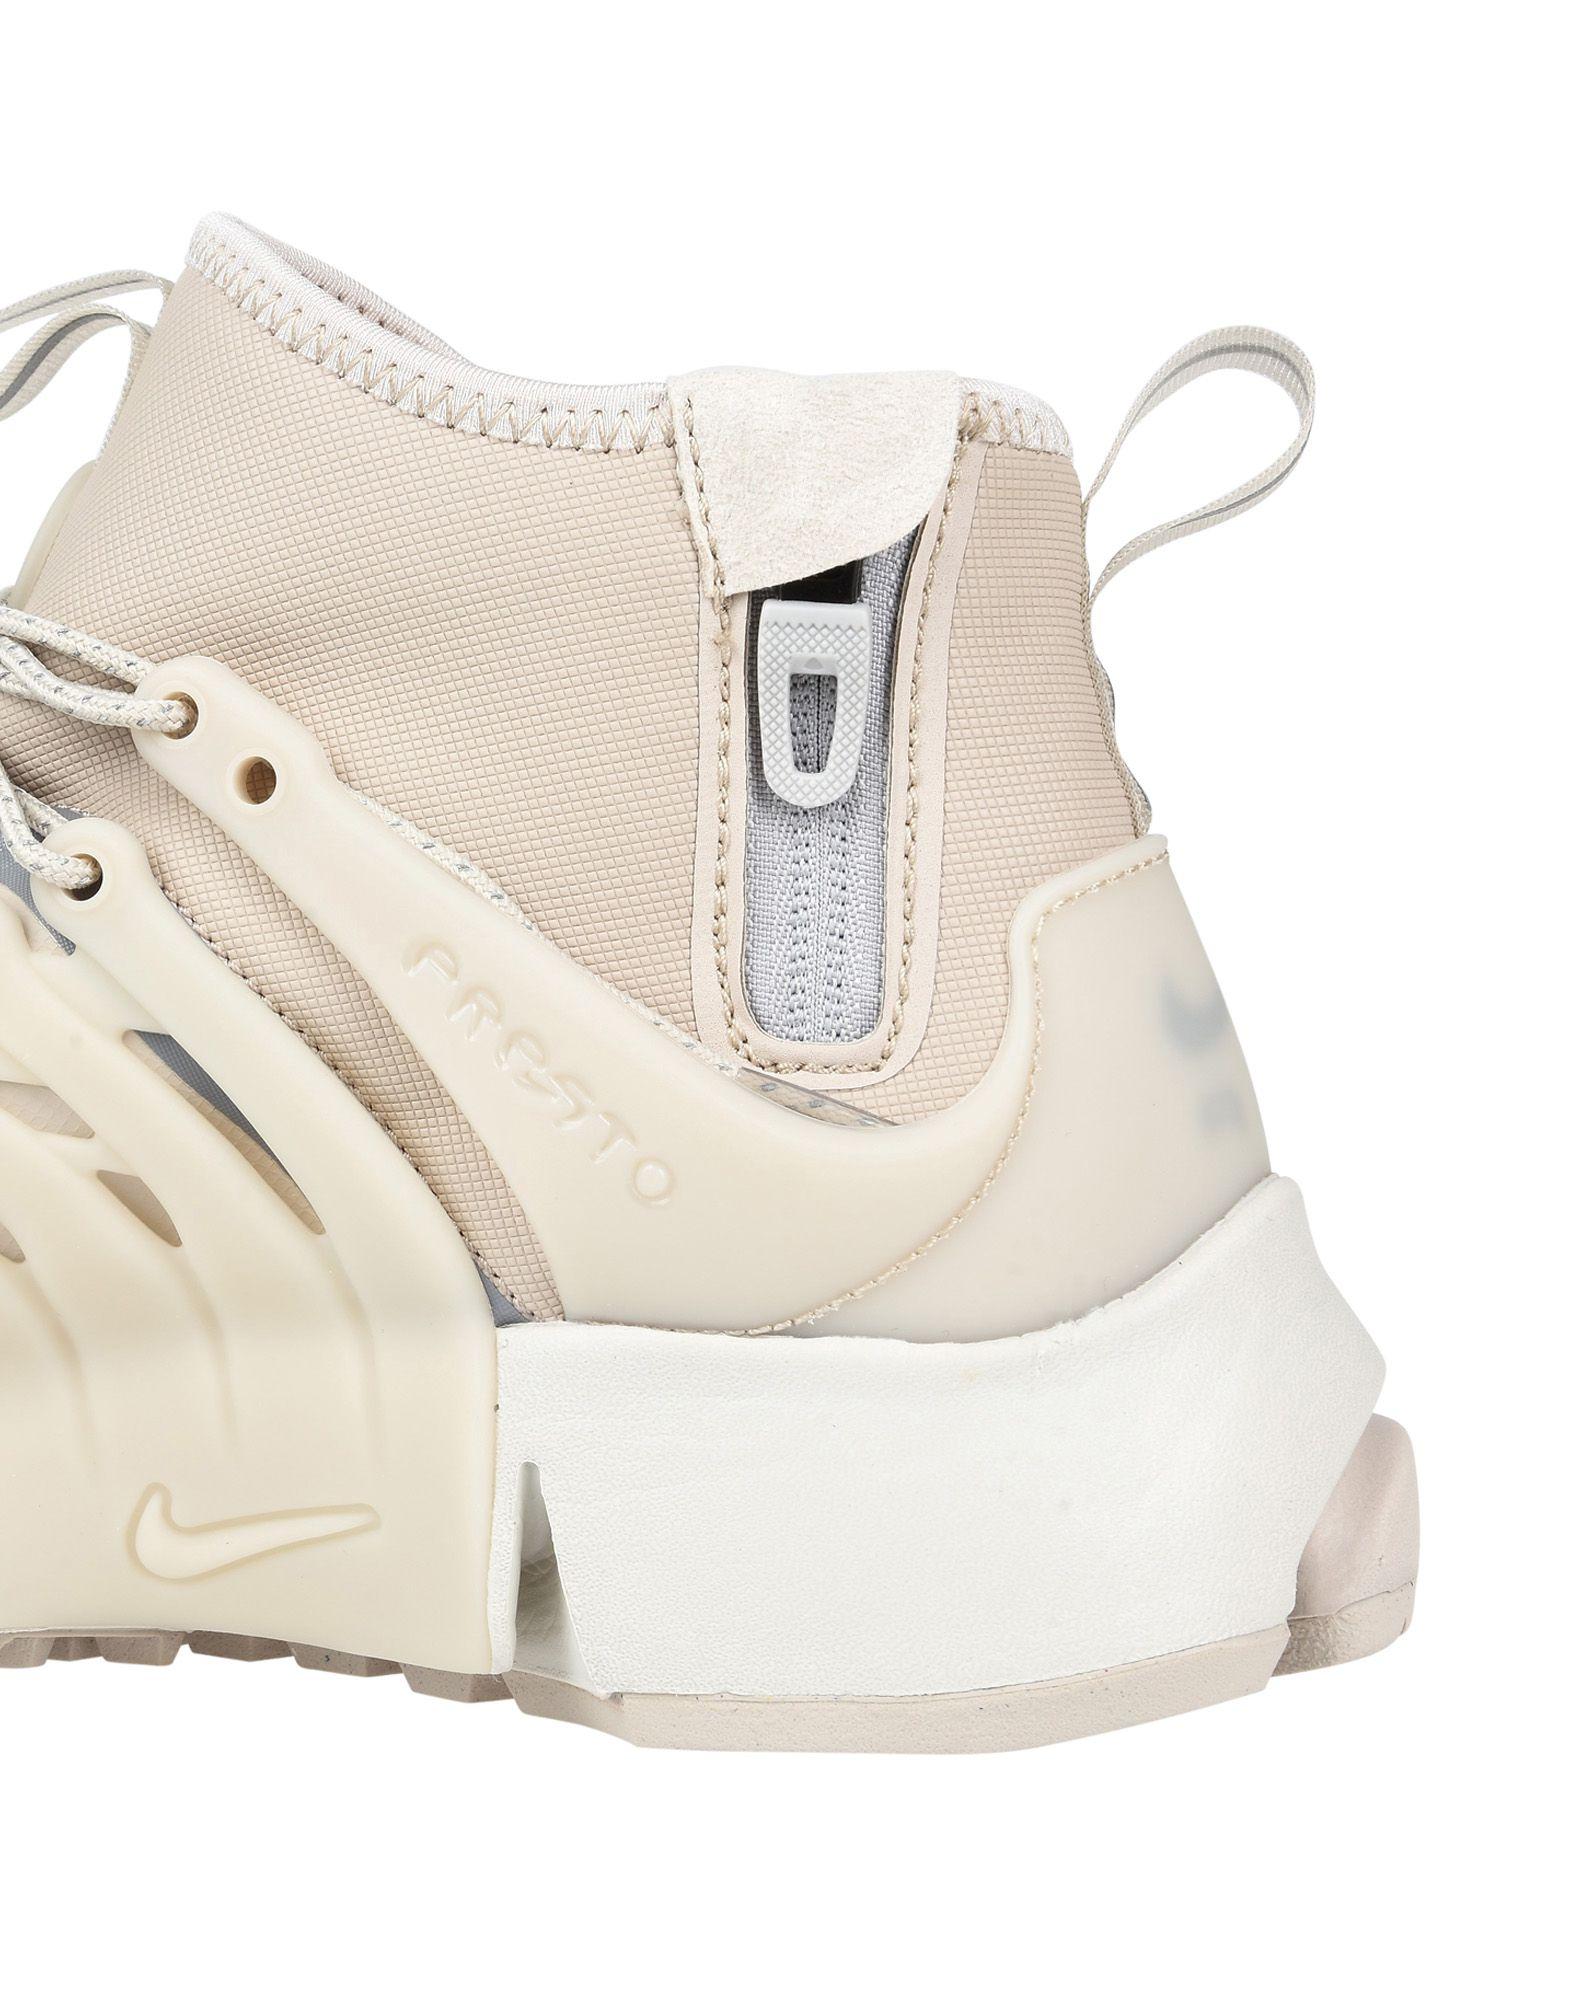 Stilvolle billige Schuhe Nike  Air 11177110MG Presto Mid Utility  11177110MG Air fed74a